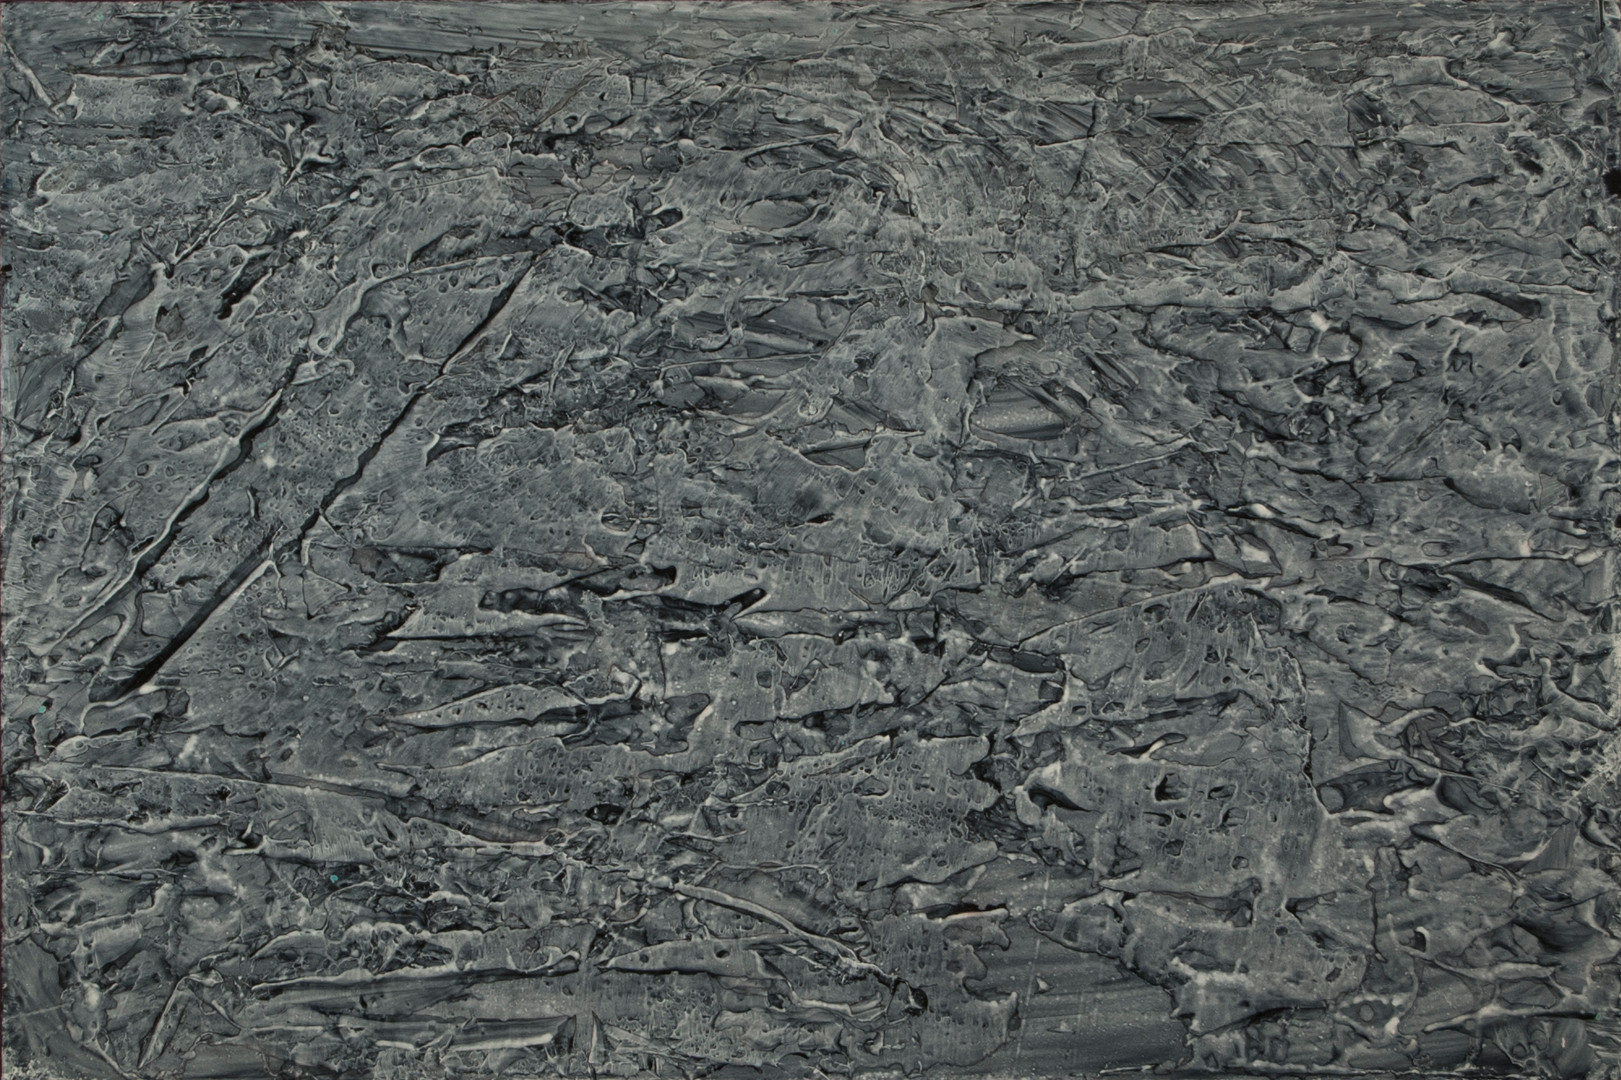 Edifice, acrylic on panel, 36x24, 2017